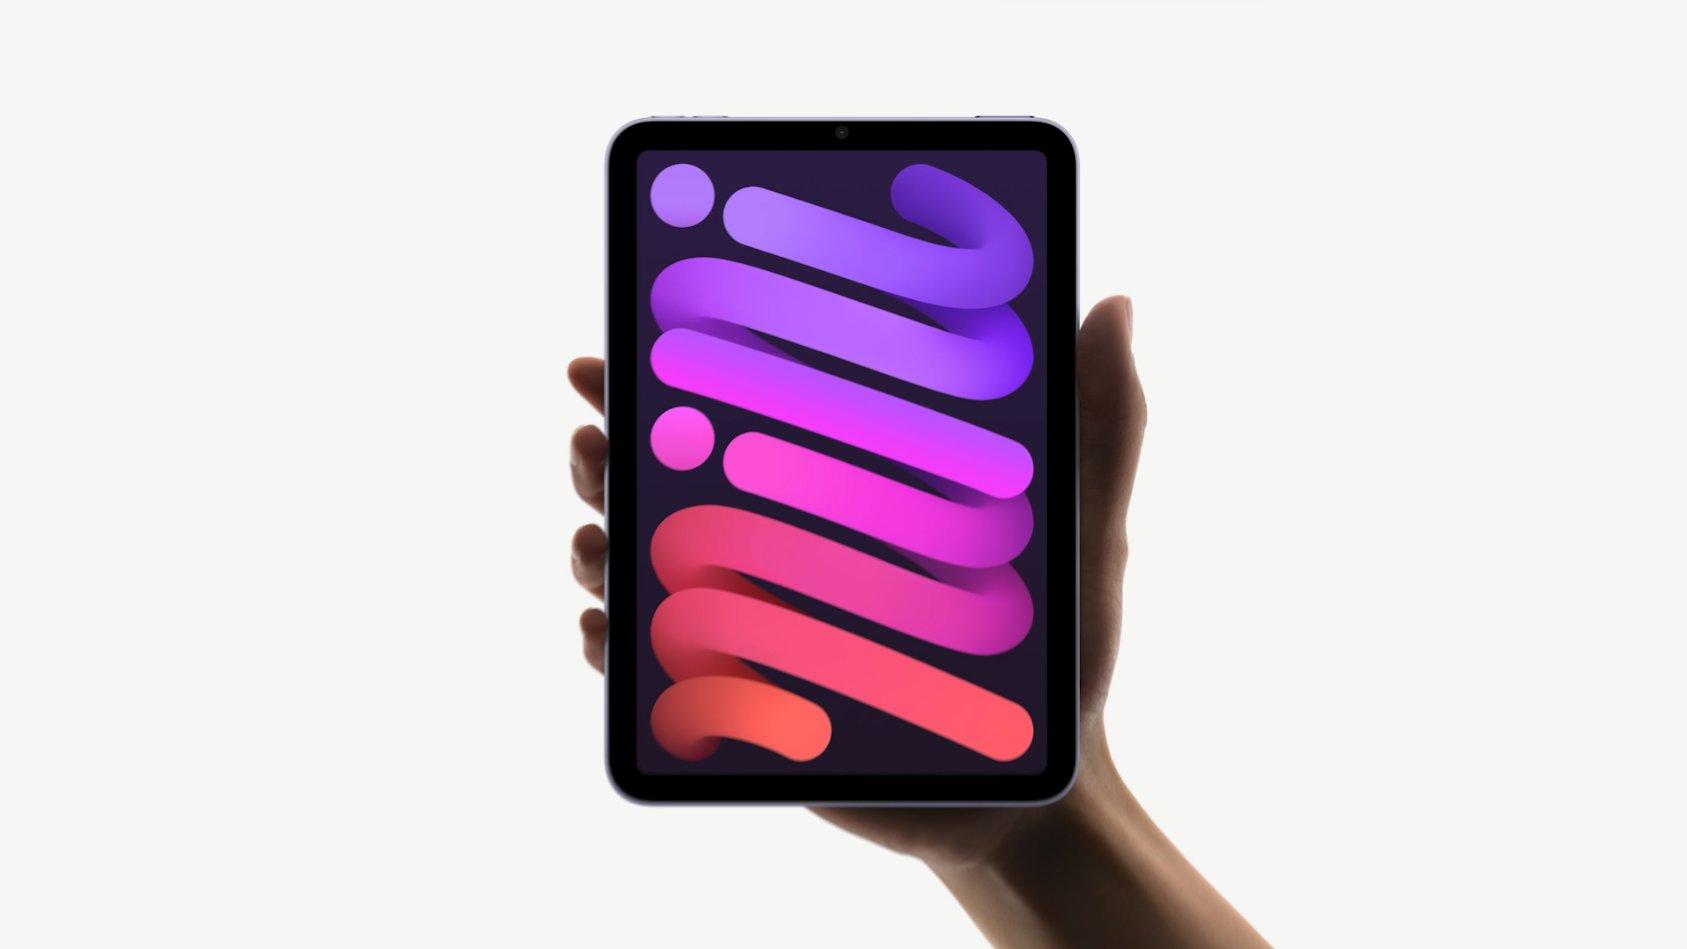 E Qxr7zXsA4n42q - Apple refreshes the iPad mini for 2021